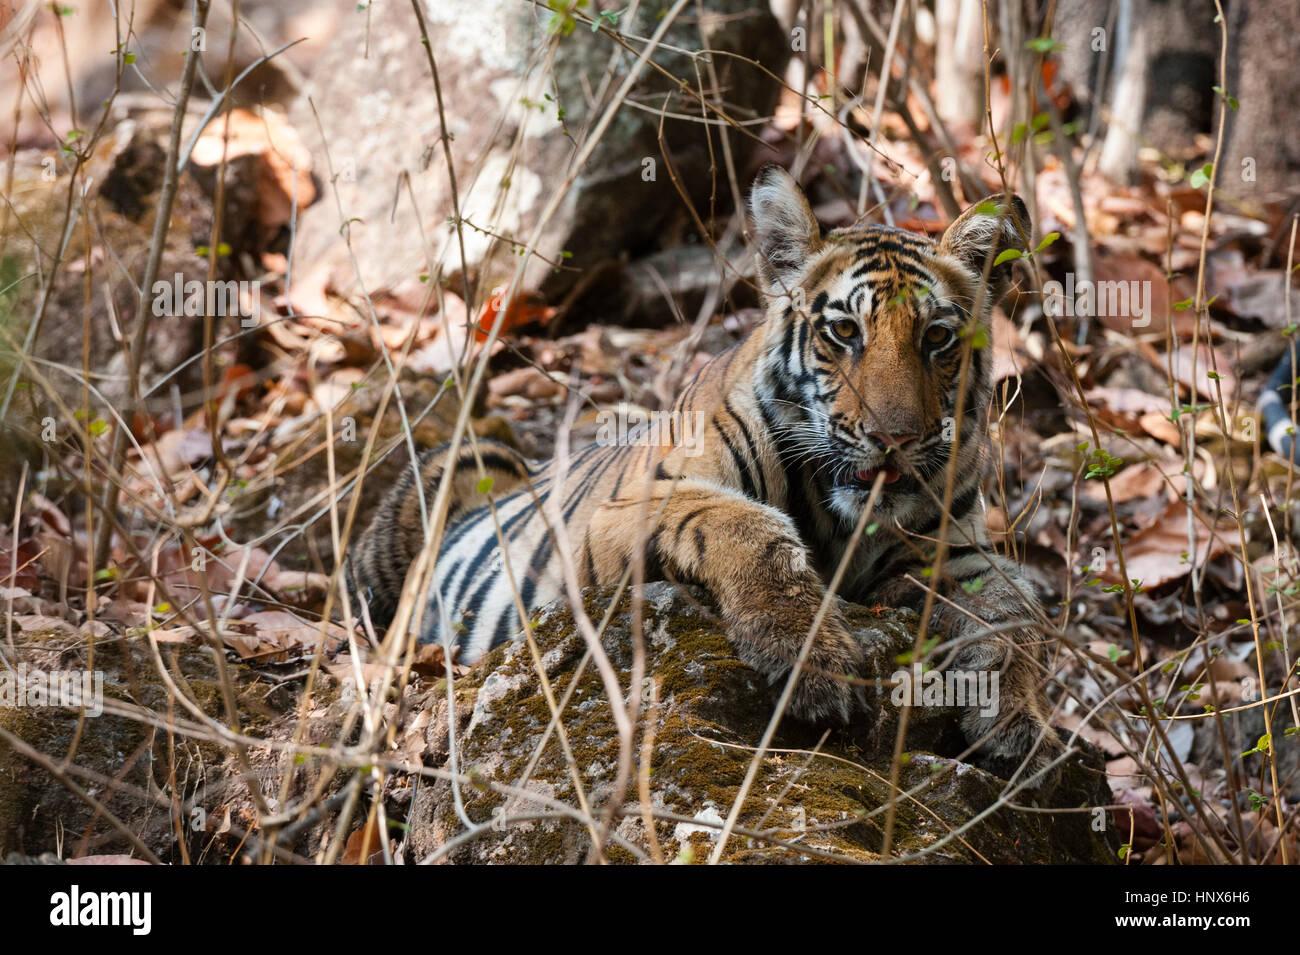 Bengal tiger cub (Panthera tigris tigris), Bandhavgarh National Park, India - Stock Image